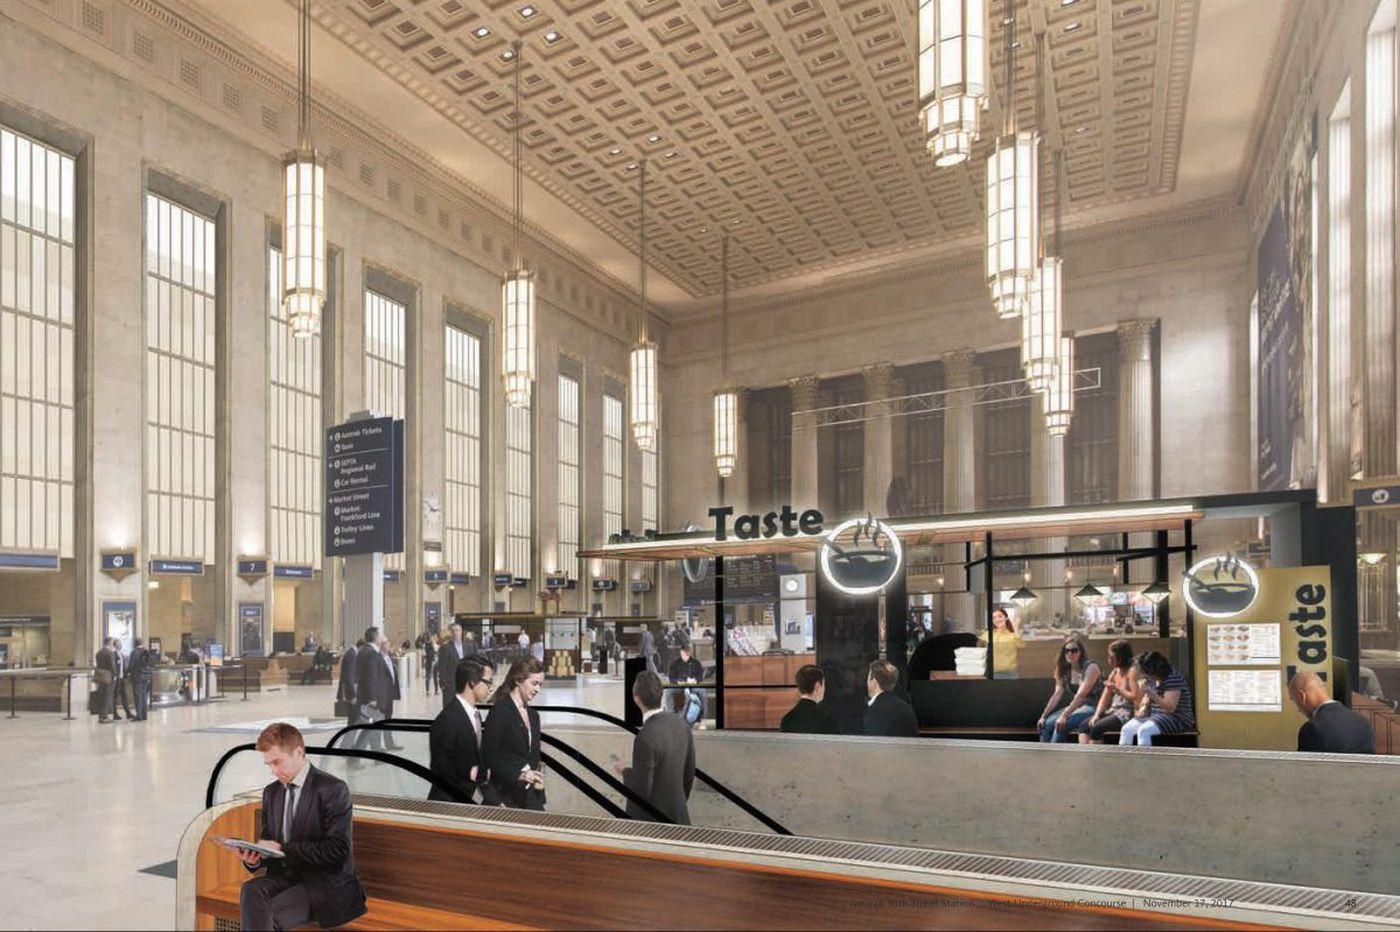 Amtrak shortlists development teams for 30th St. Station revamp